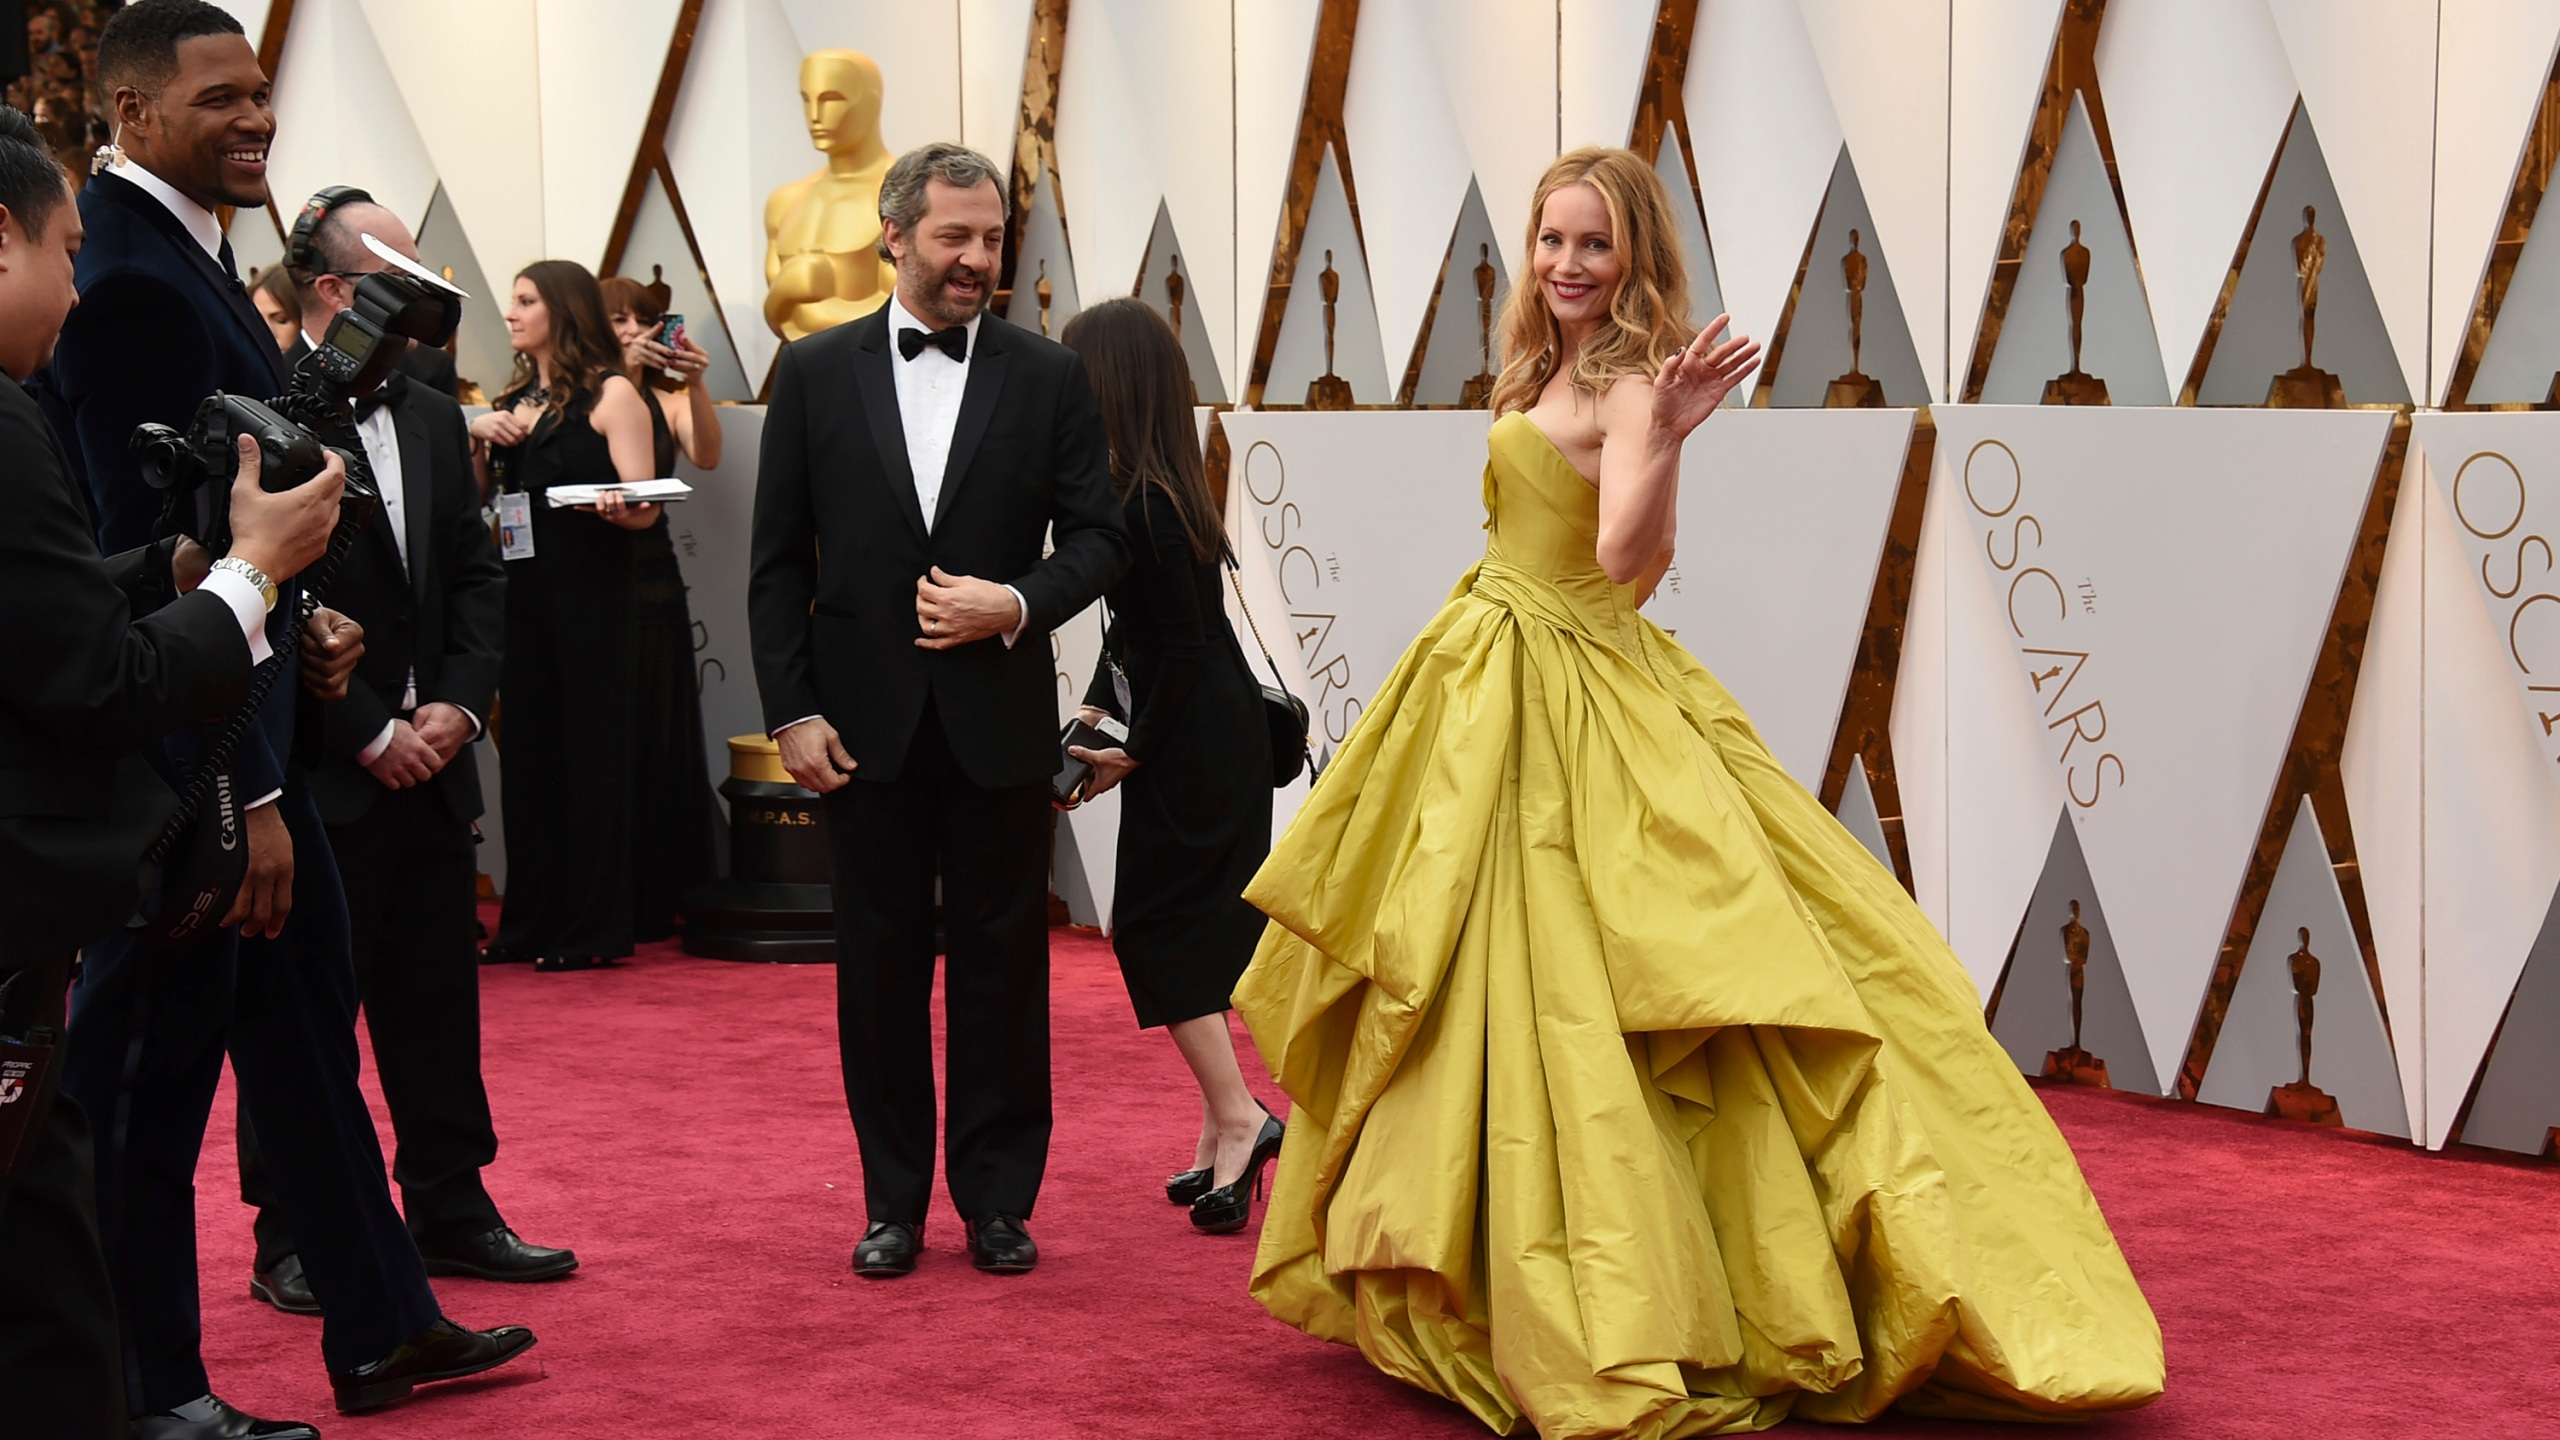 Photos Celebrities Nominees Walk Oscars Red Carpet